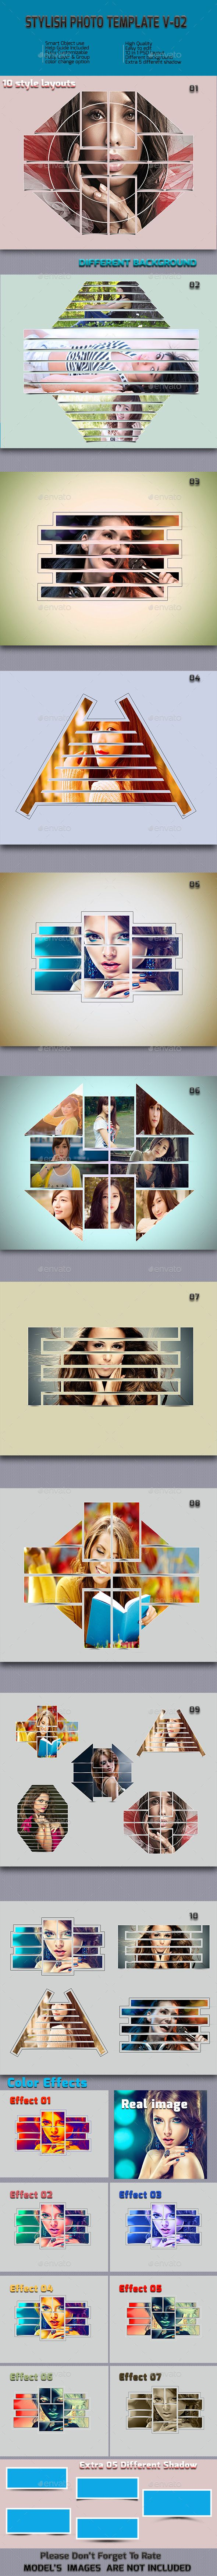 Stylish Photo  Frame Templates V-02